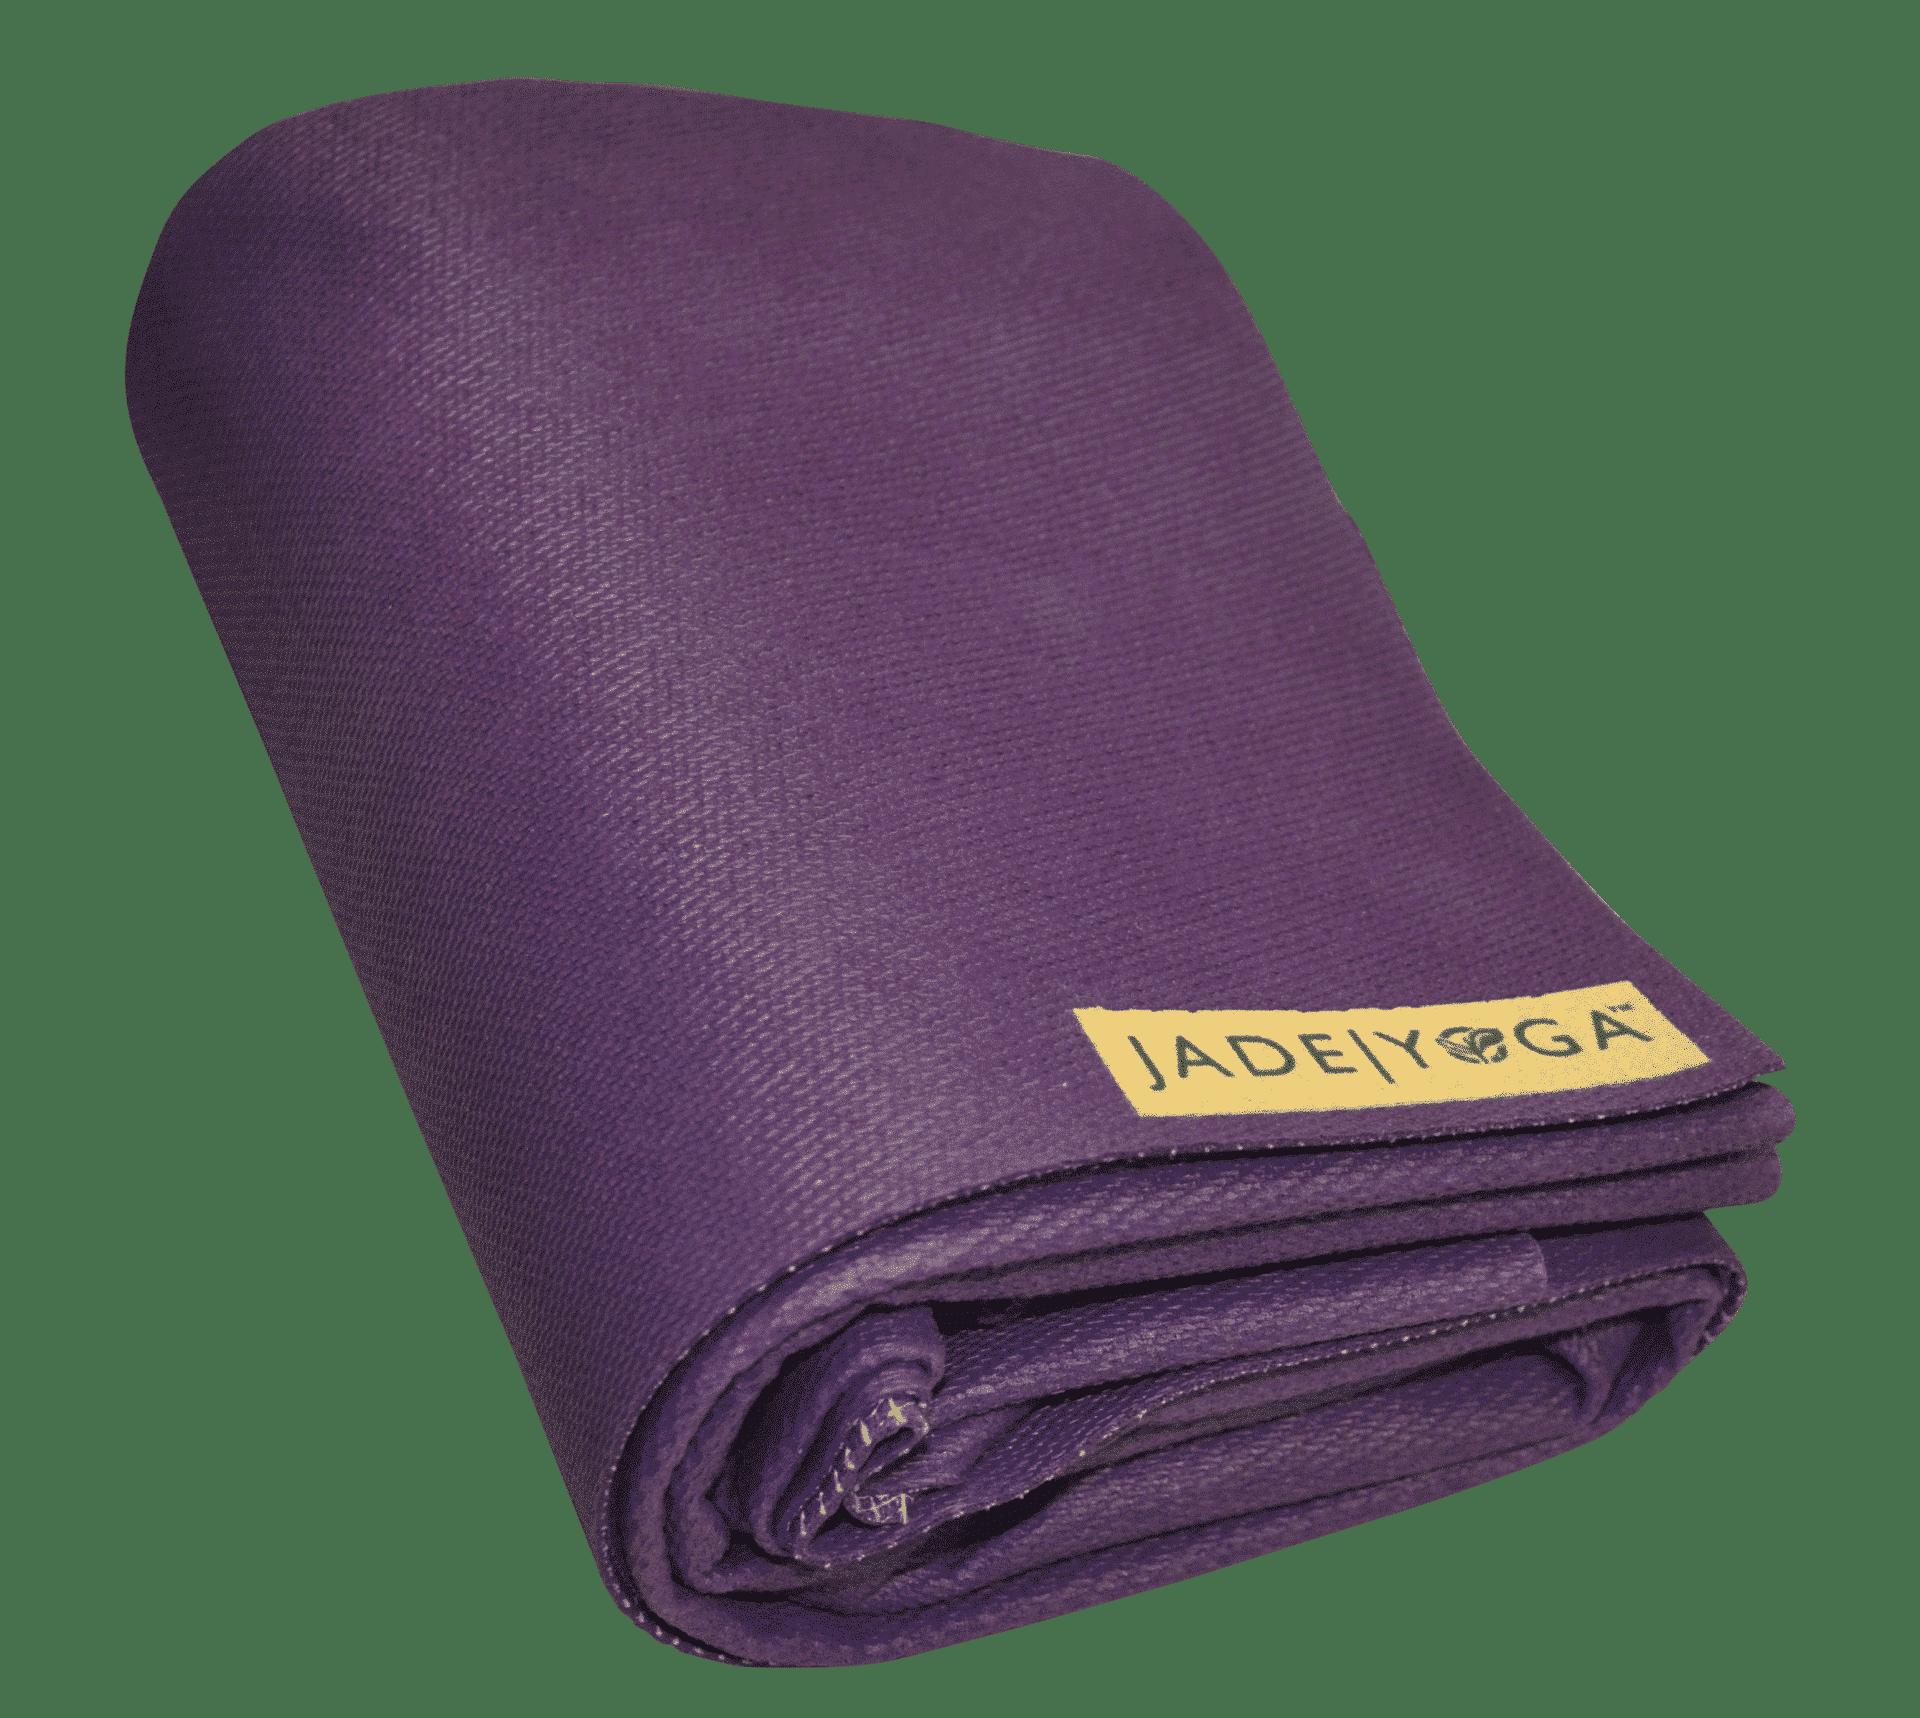 Jade Voyager Purple folded